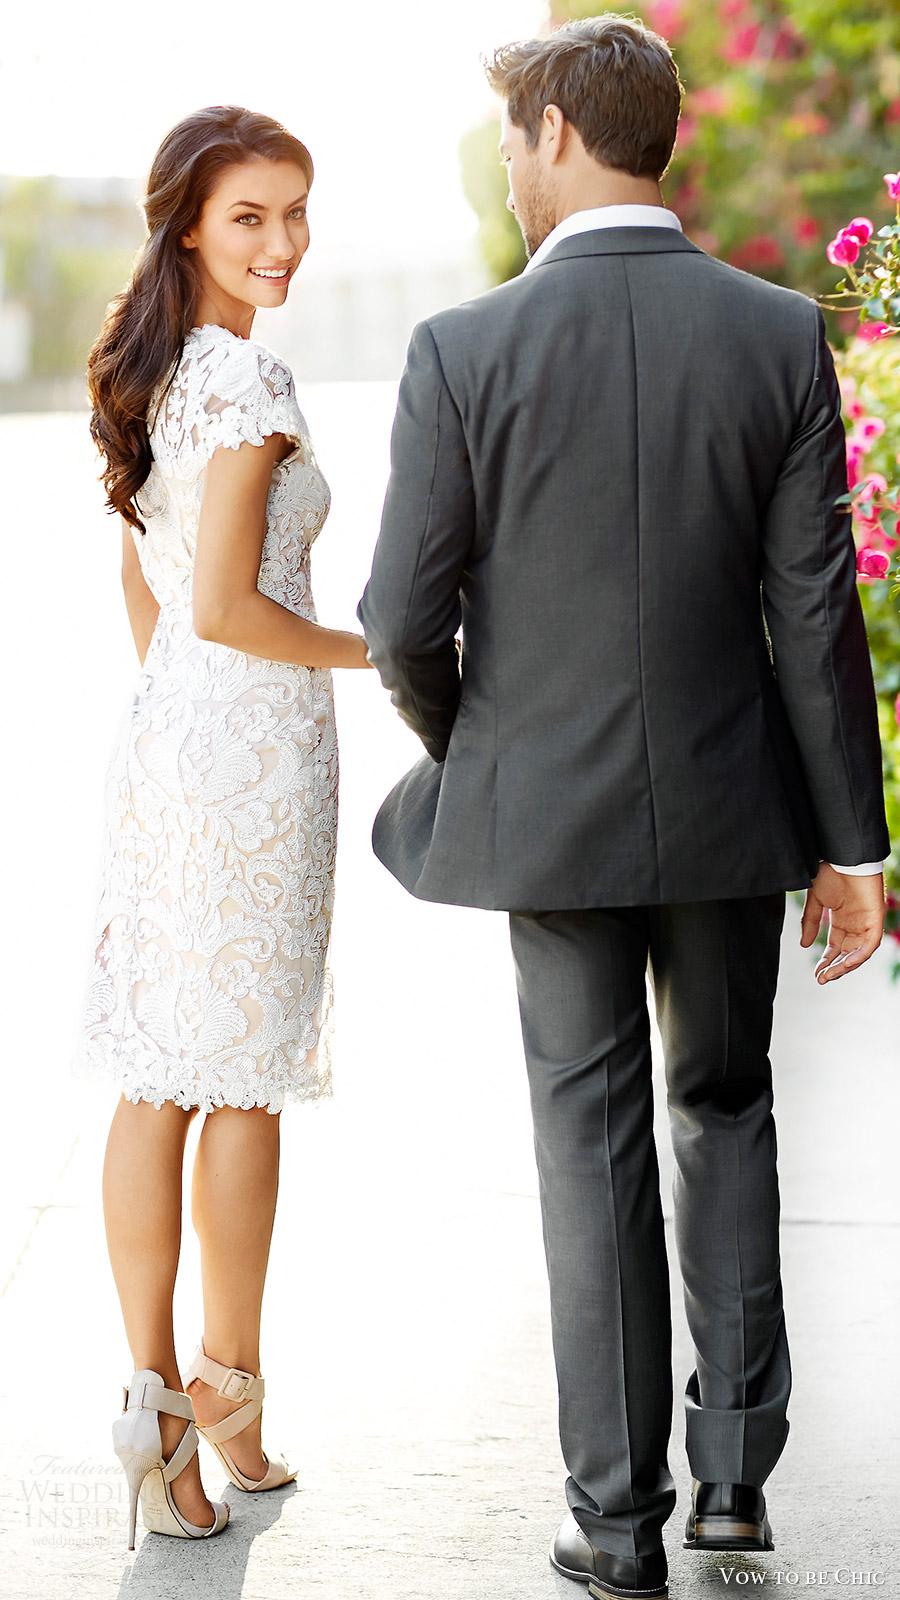 vow to be chic 2016 bridal rental tadashi shoji elizabeth lace short wedding dress cap sleeves back